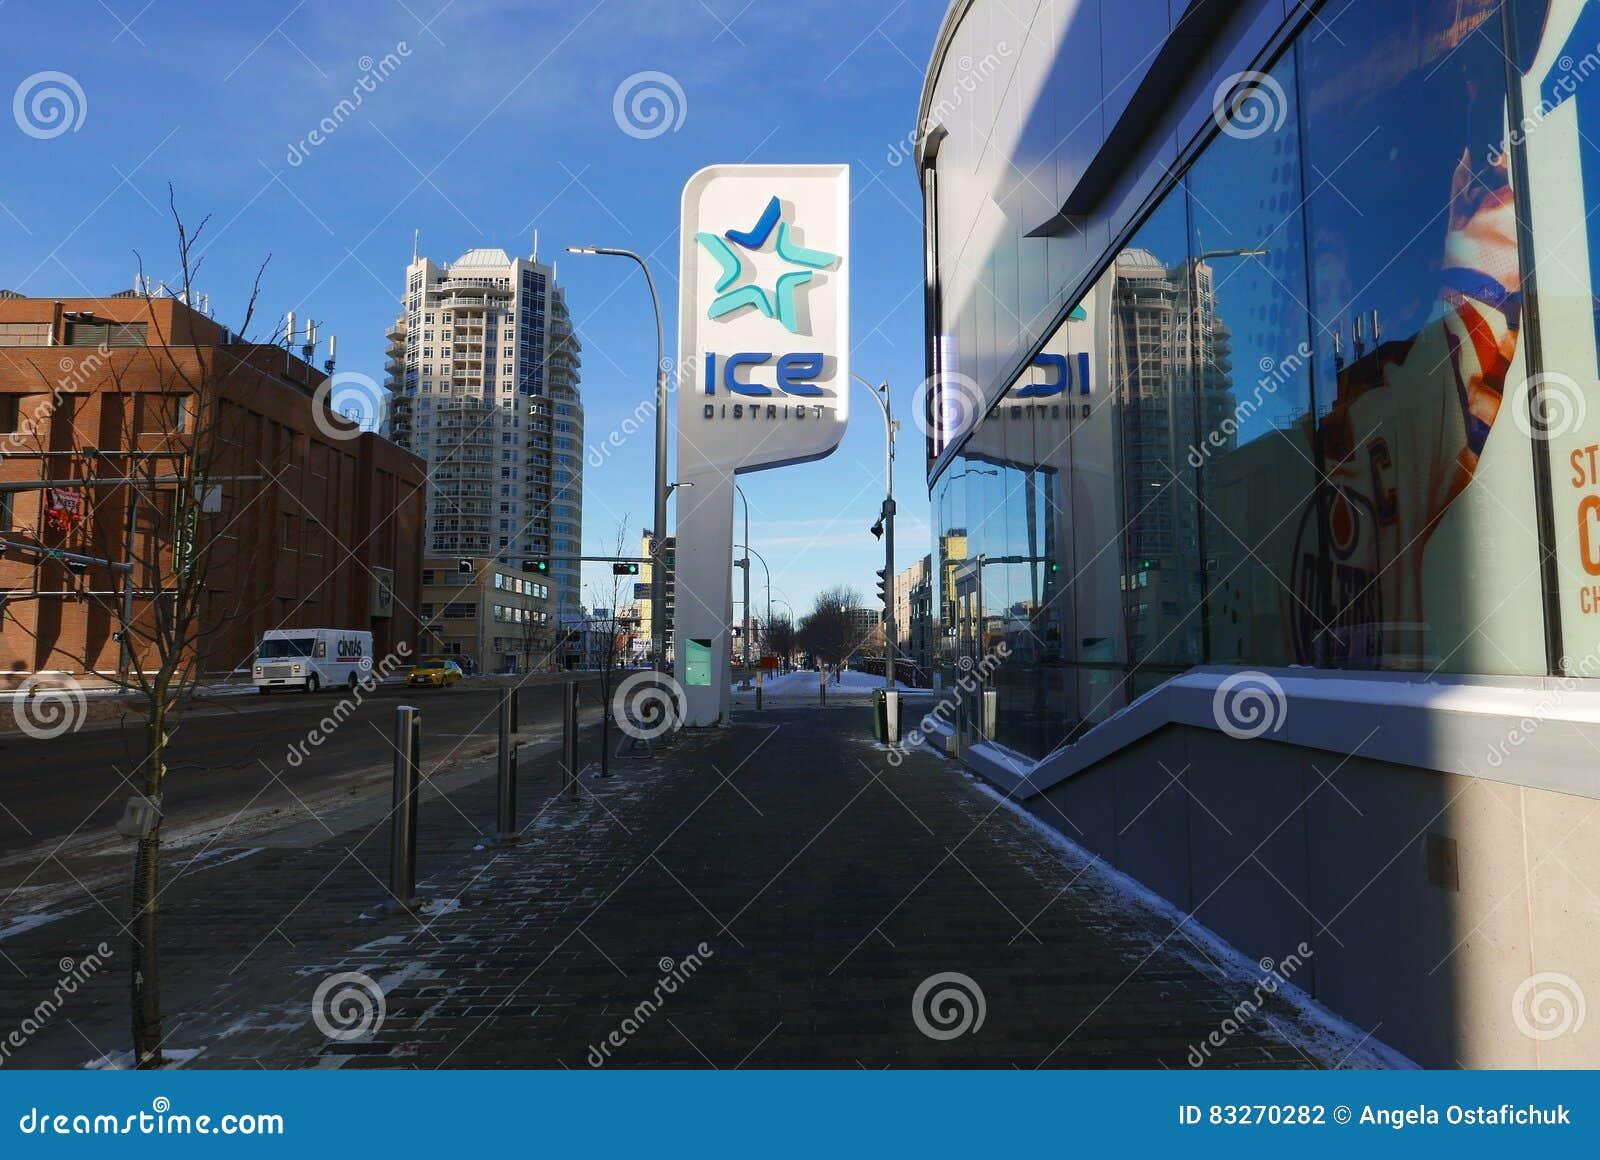 Edmonton, Canada-December 27, 2016: Roger`s Place in Edmonton`s Ice District